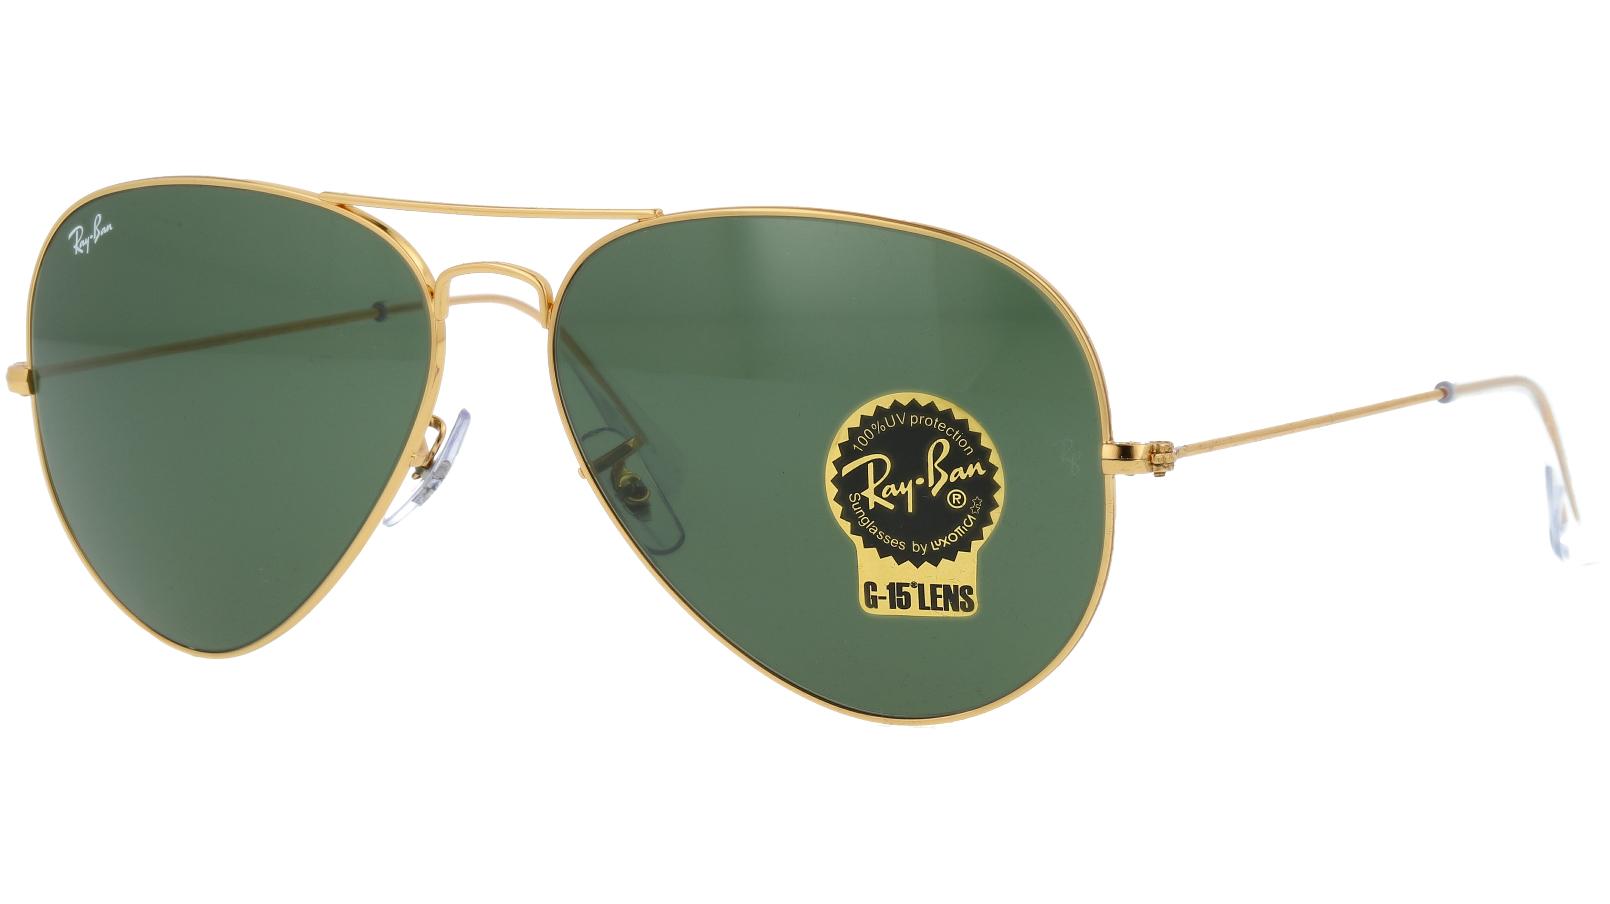 Ray-Ban RB3025 001 62 Arista Pilot Sunglasses